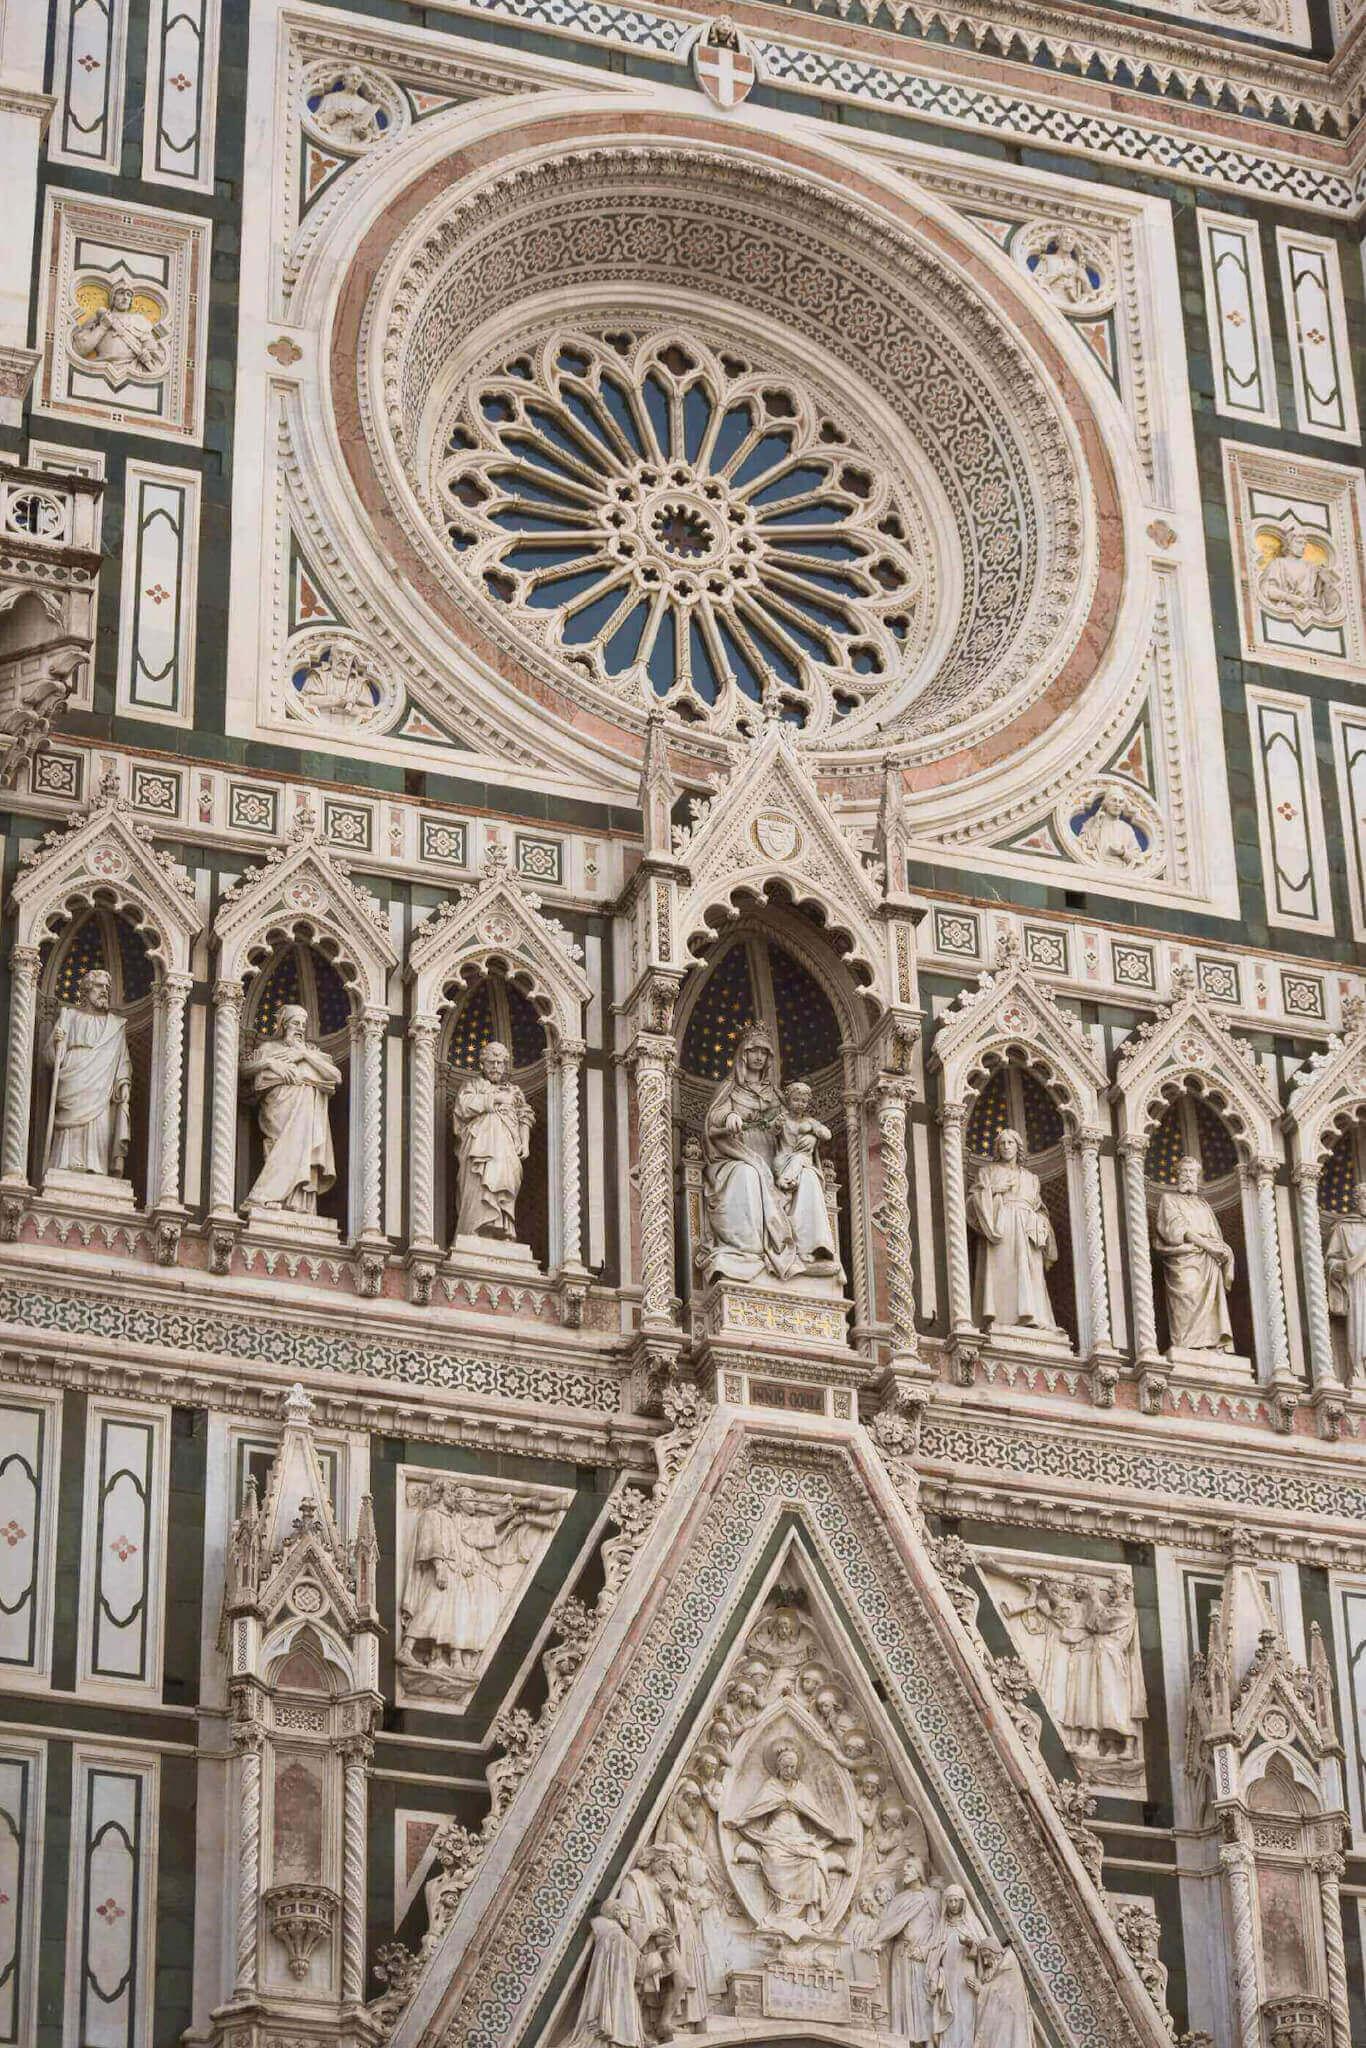 image of Cattedrale di Santa Maria del Fiore in Florence Italy